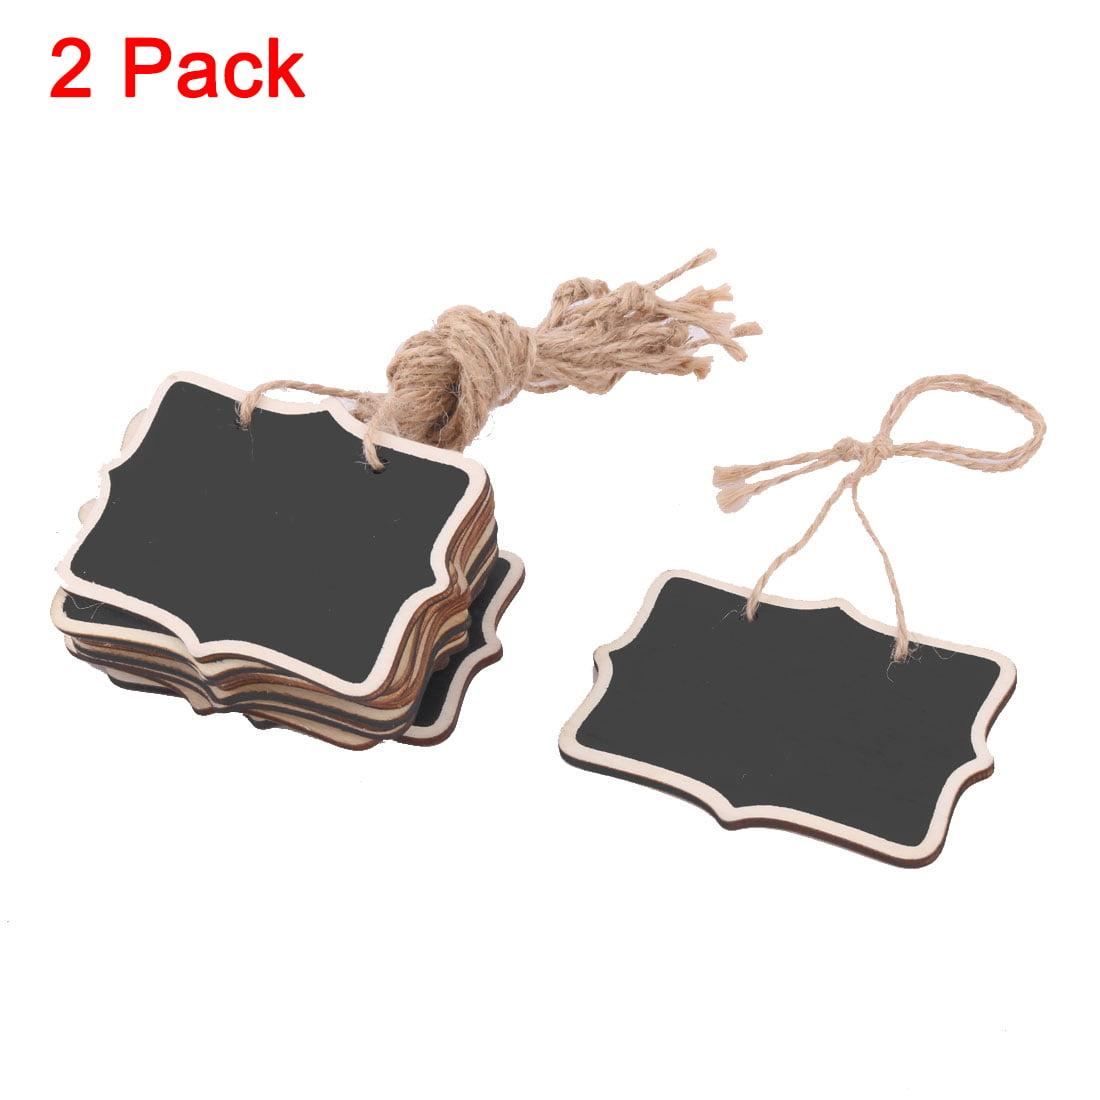 2 Pack, 12 Pcs/Pack Kitchen Wooden Message Memo String Hanging Reusable Chalkboard Blackboard